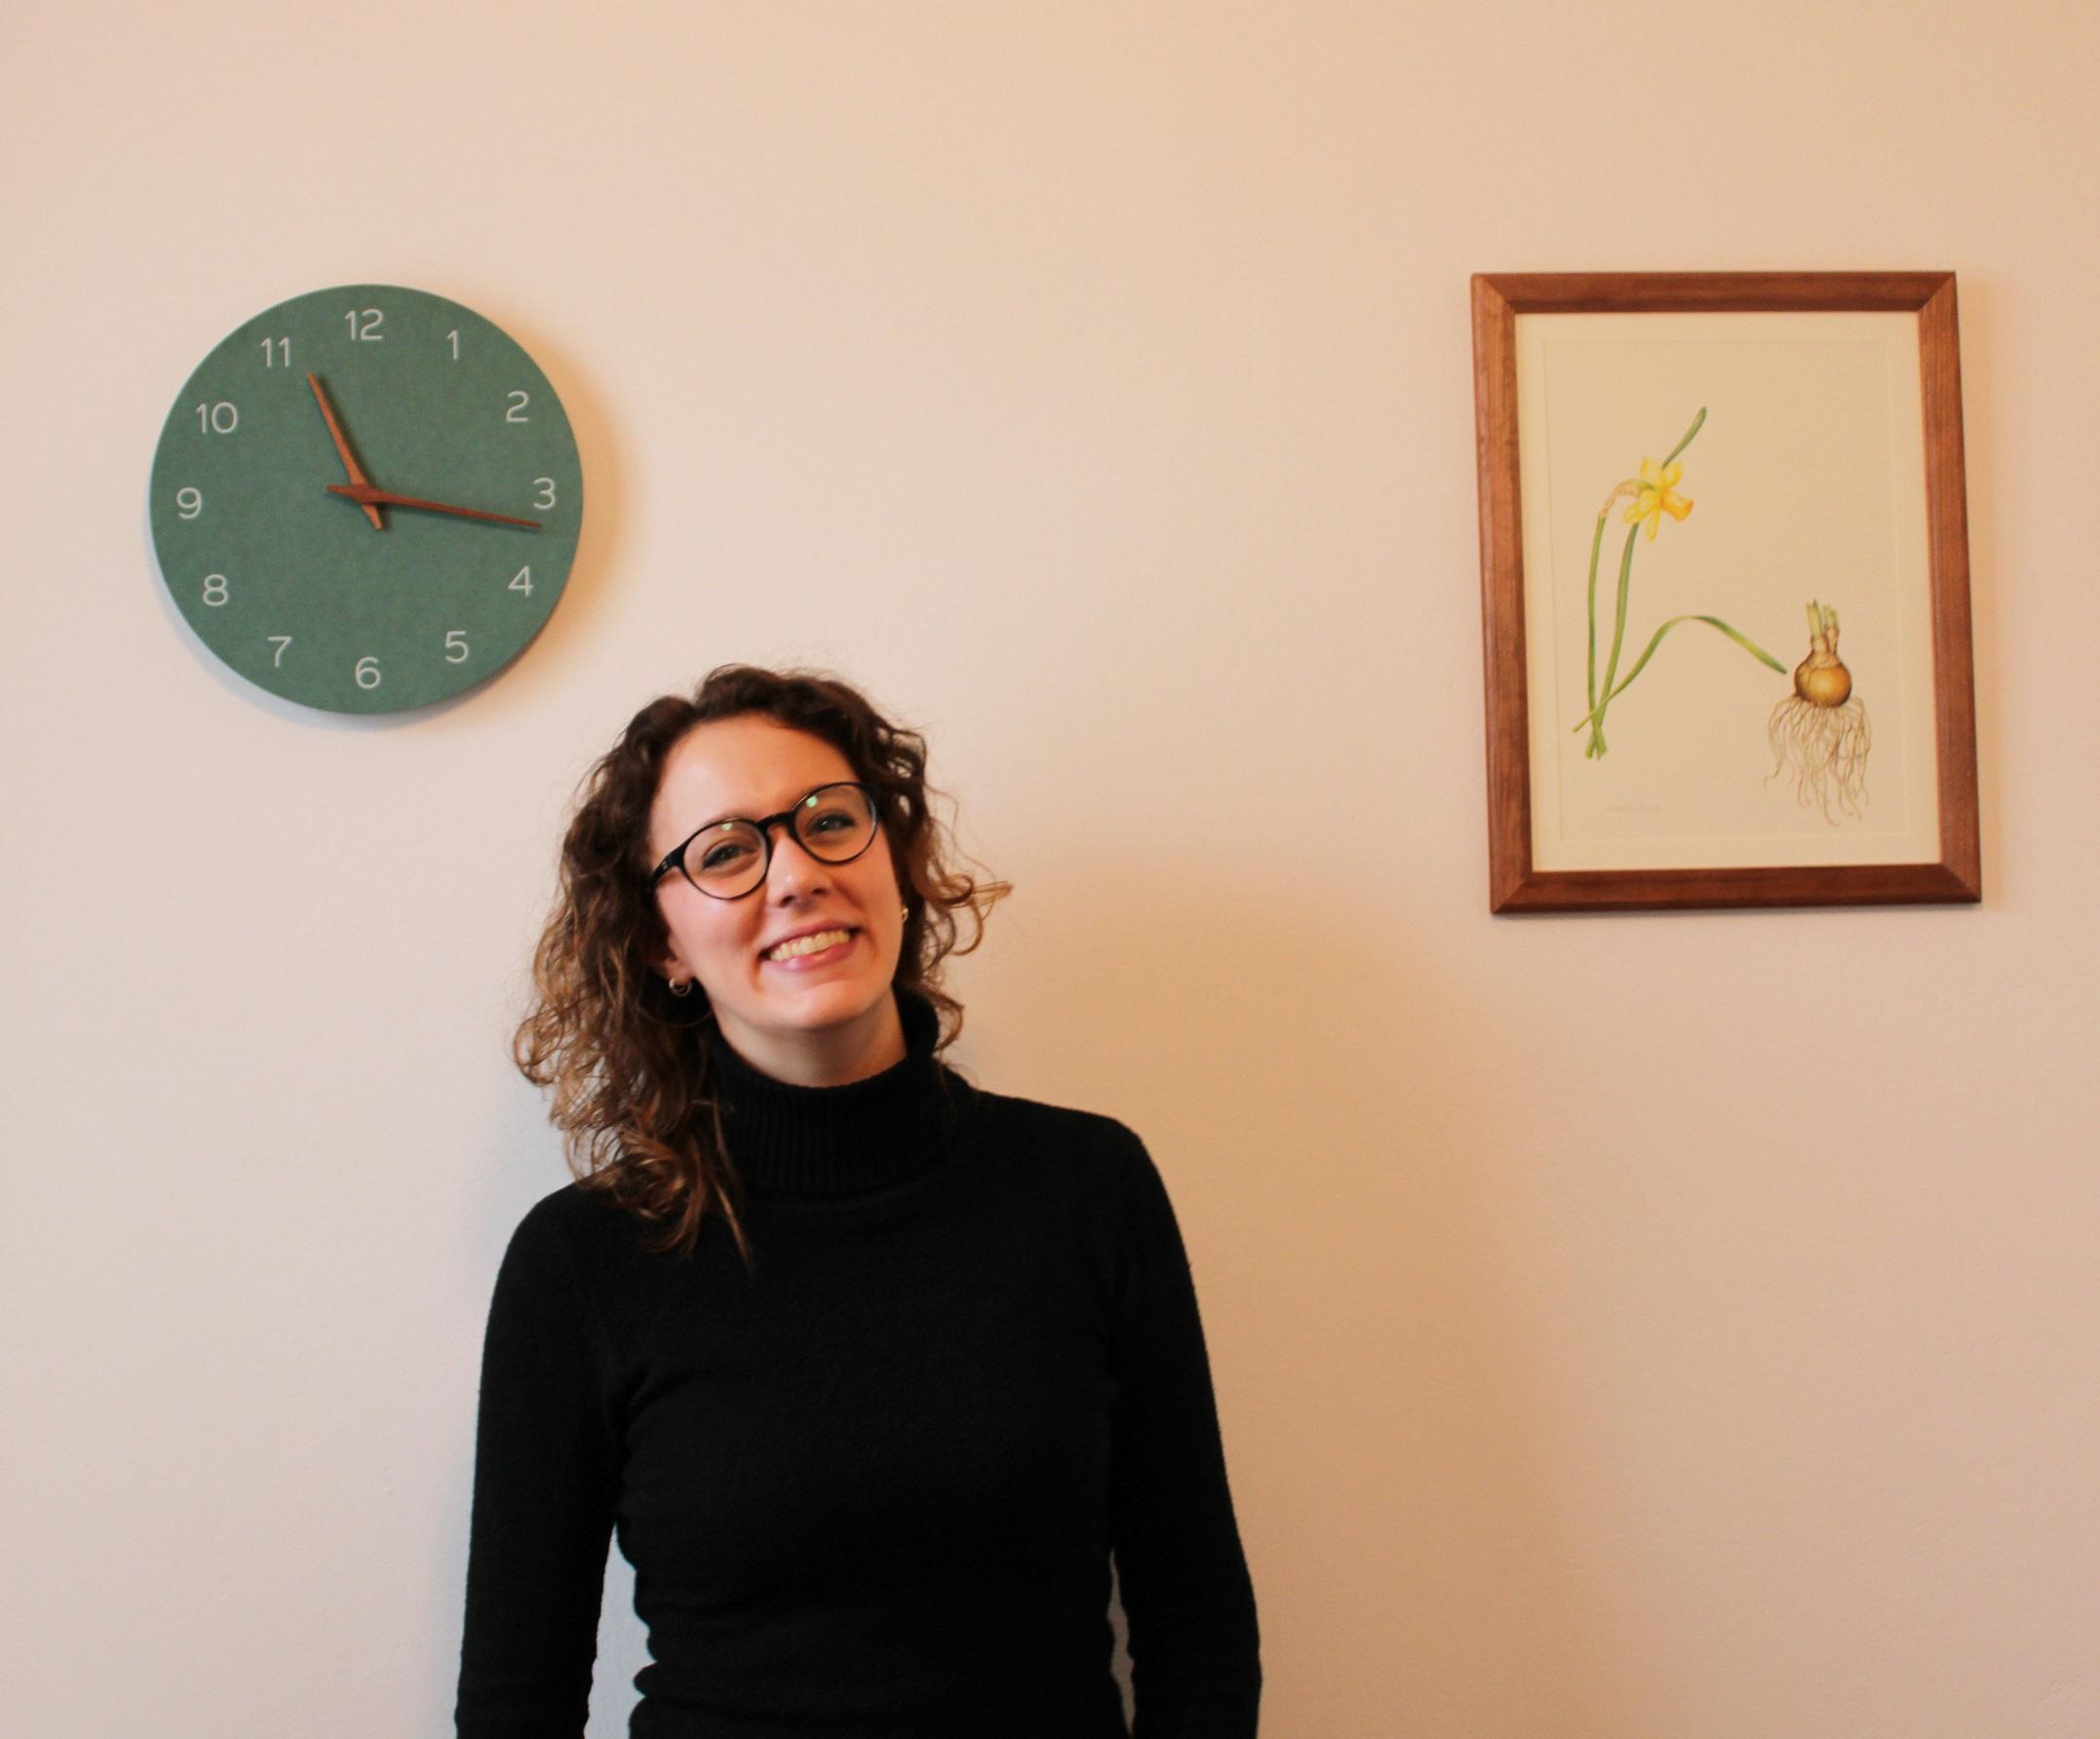 Dottoressa Matilde Bartolini